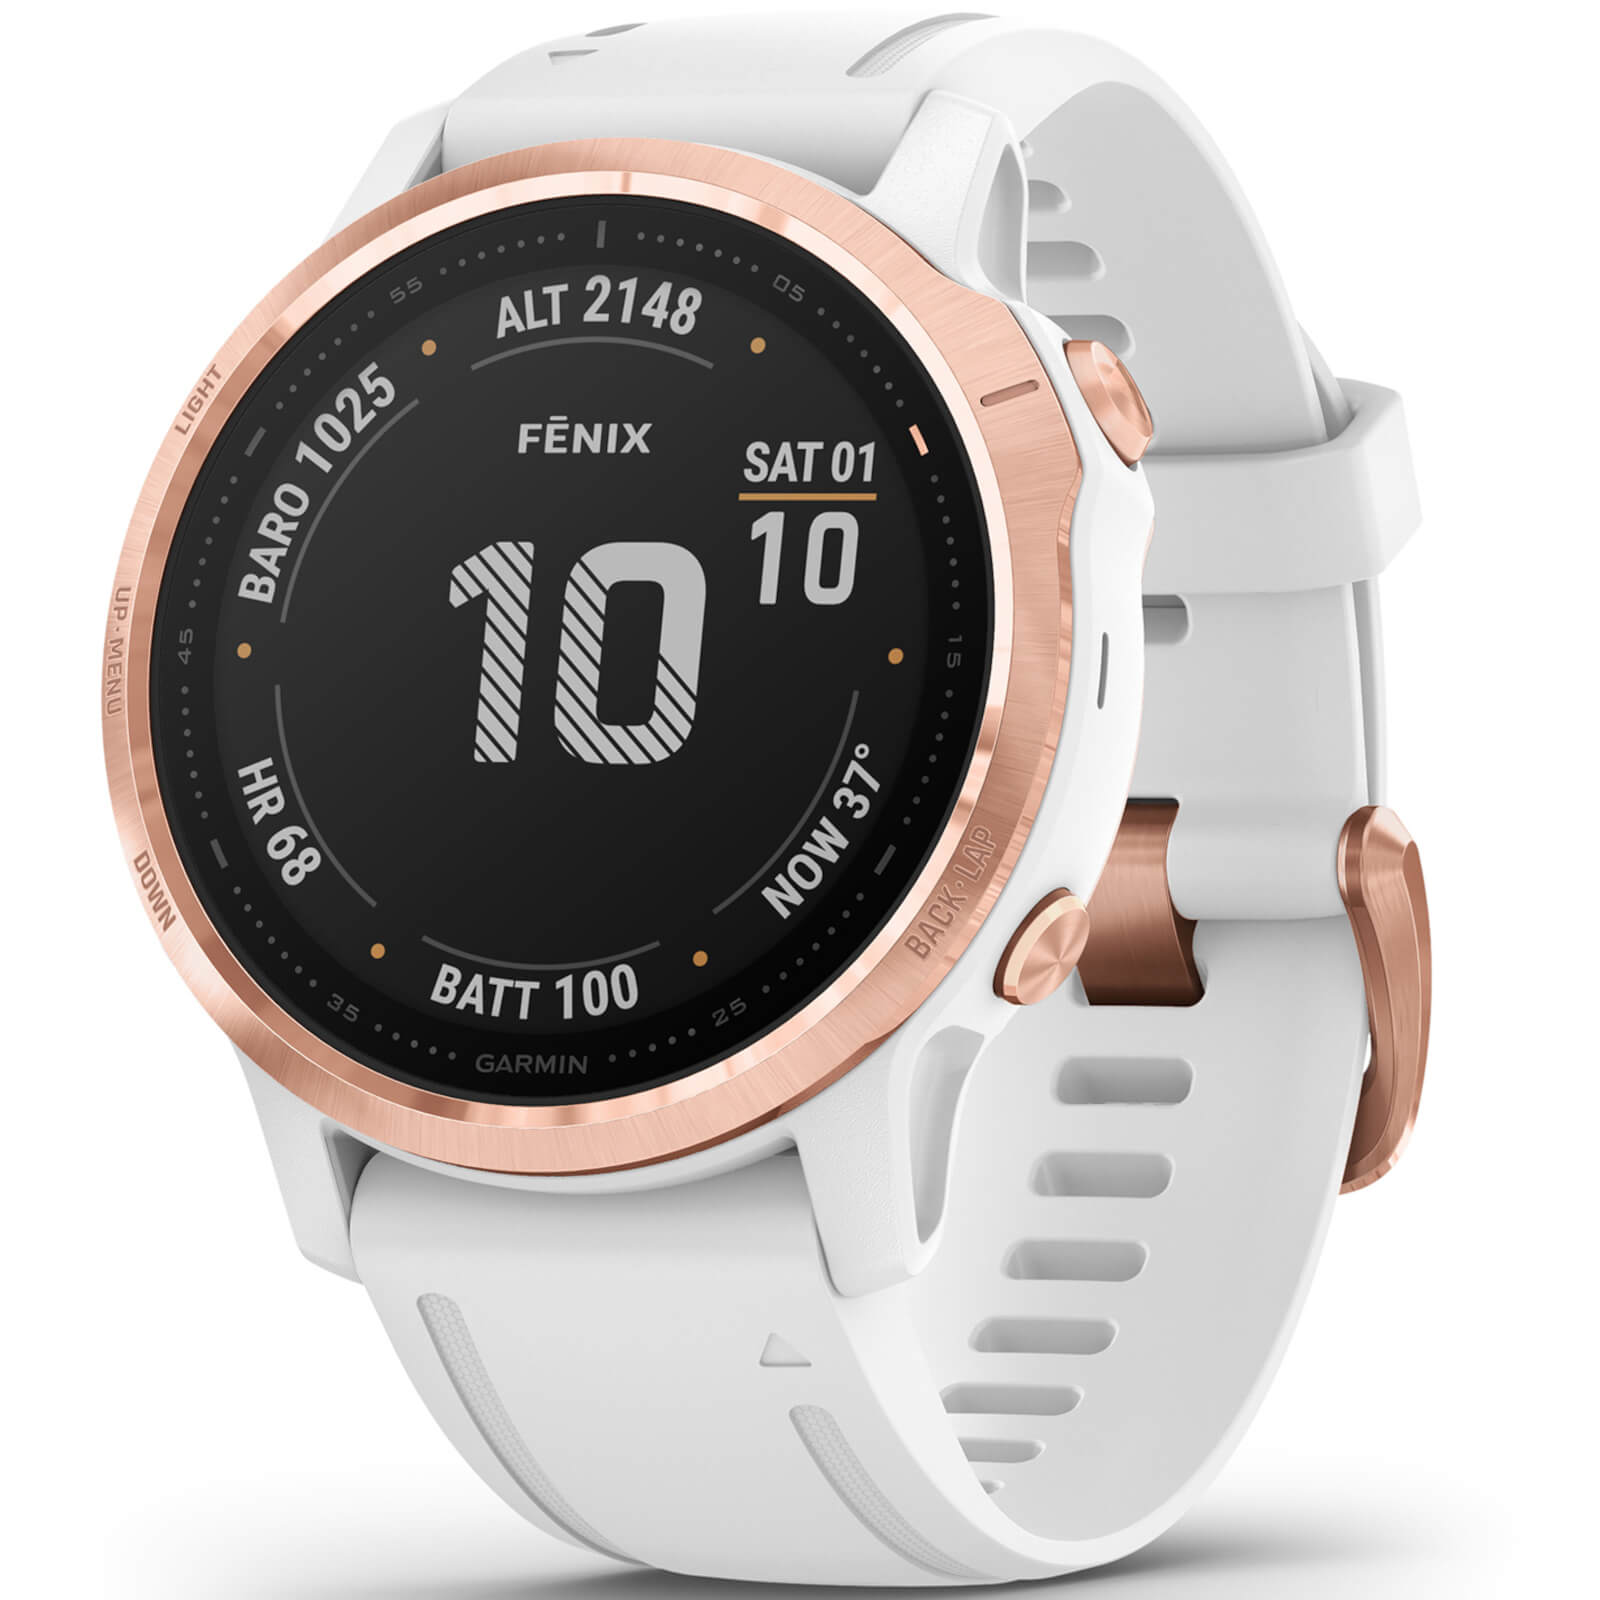 Garmin Fenix 6S Pro GPS Watch - Rose Gold/White